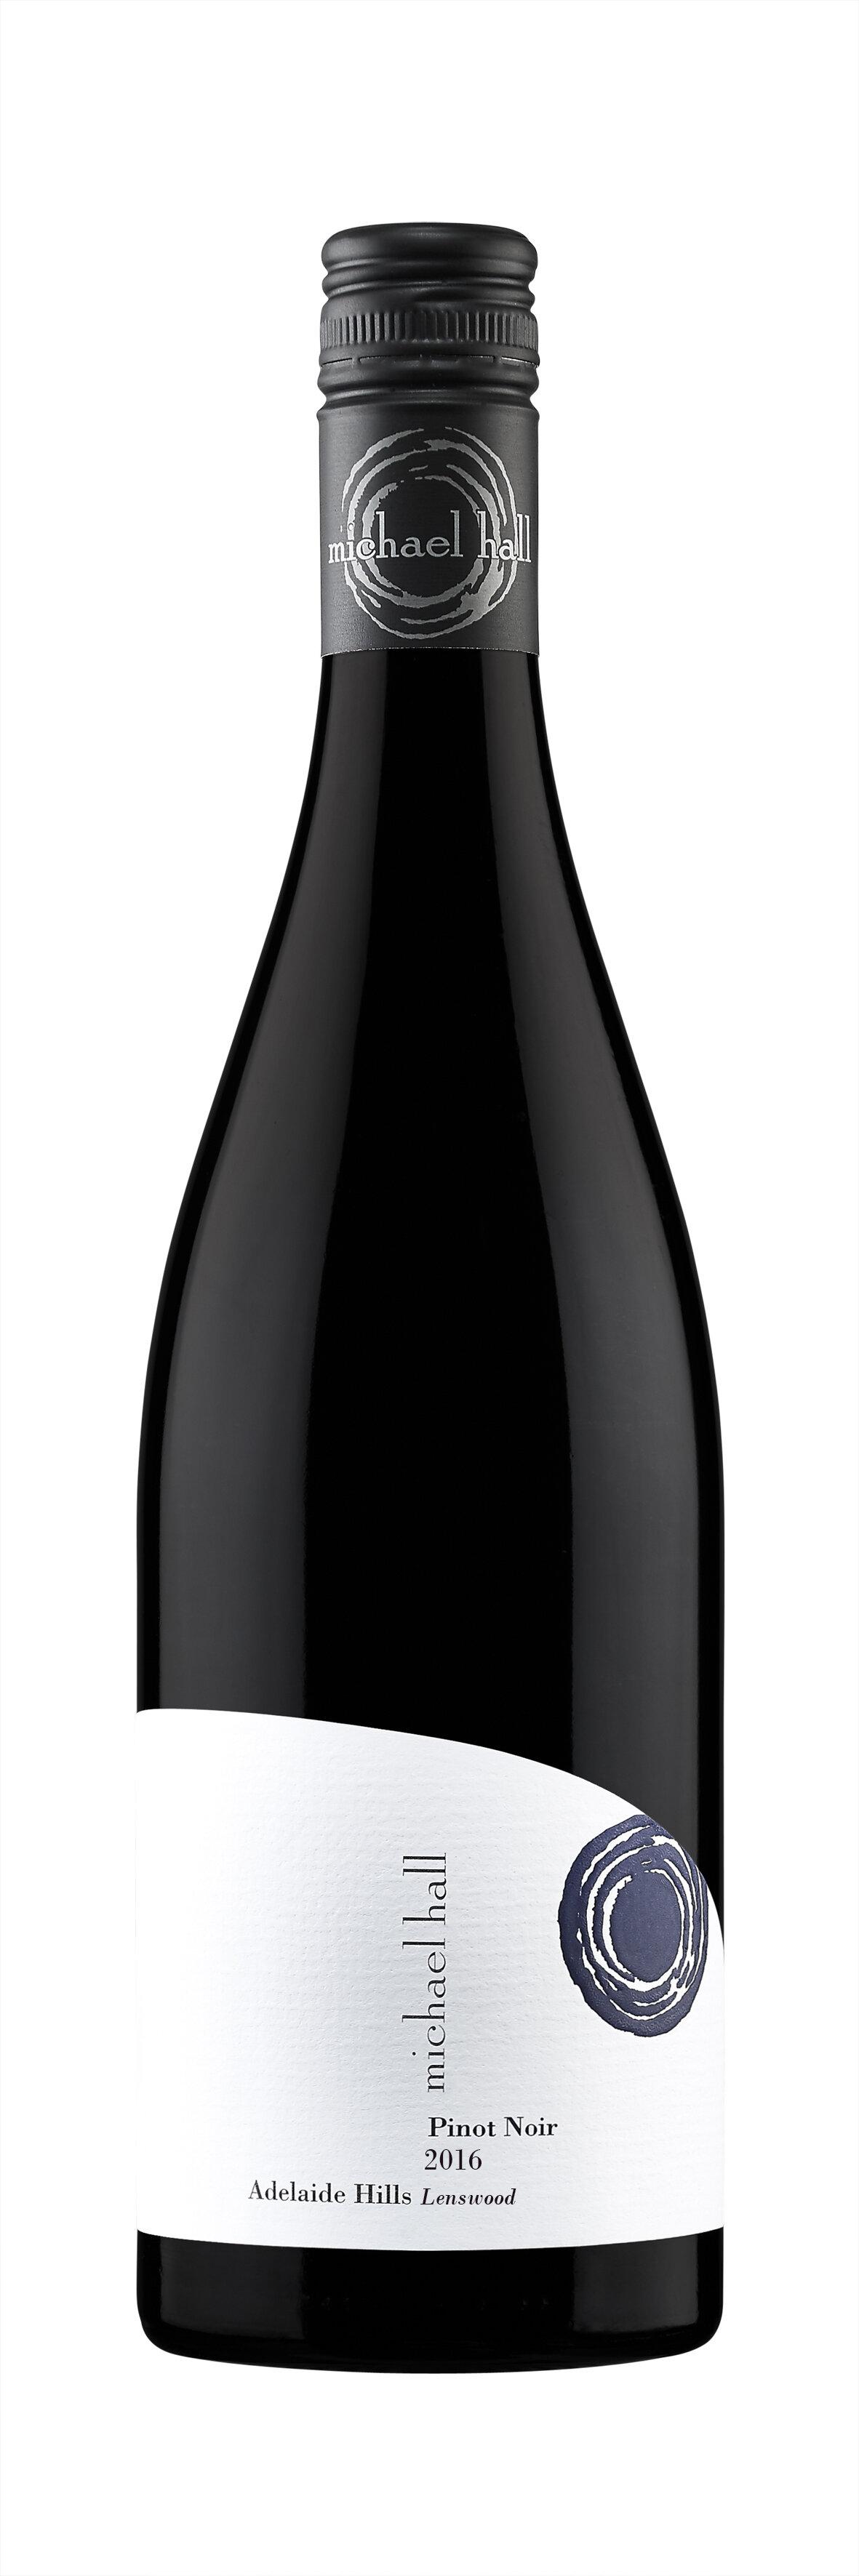 Michael Hall Pinot Noir